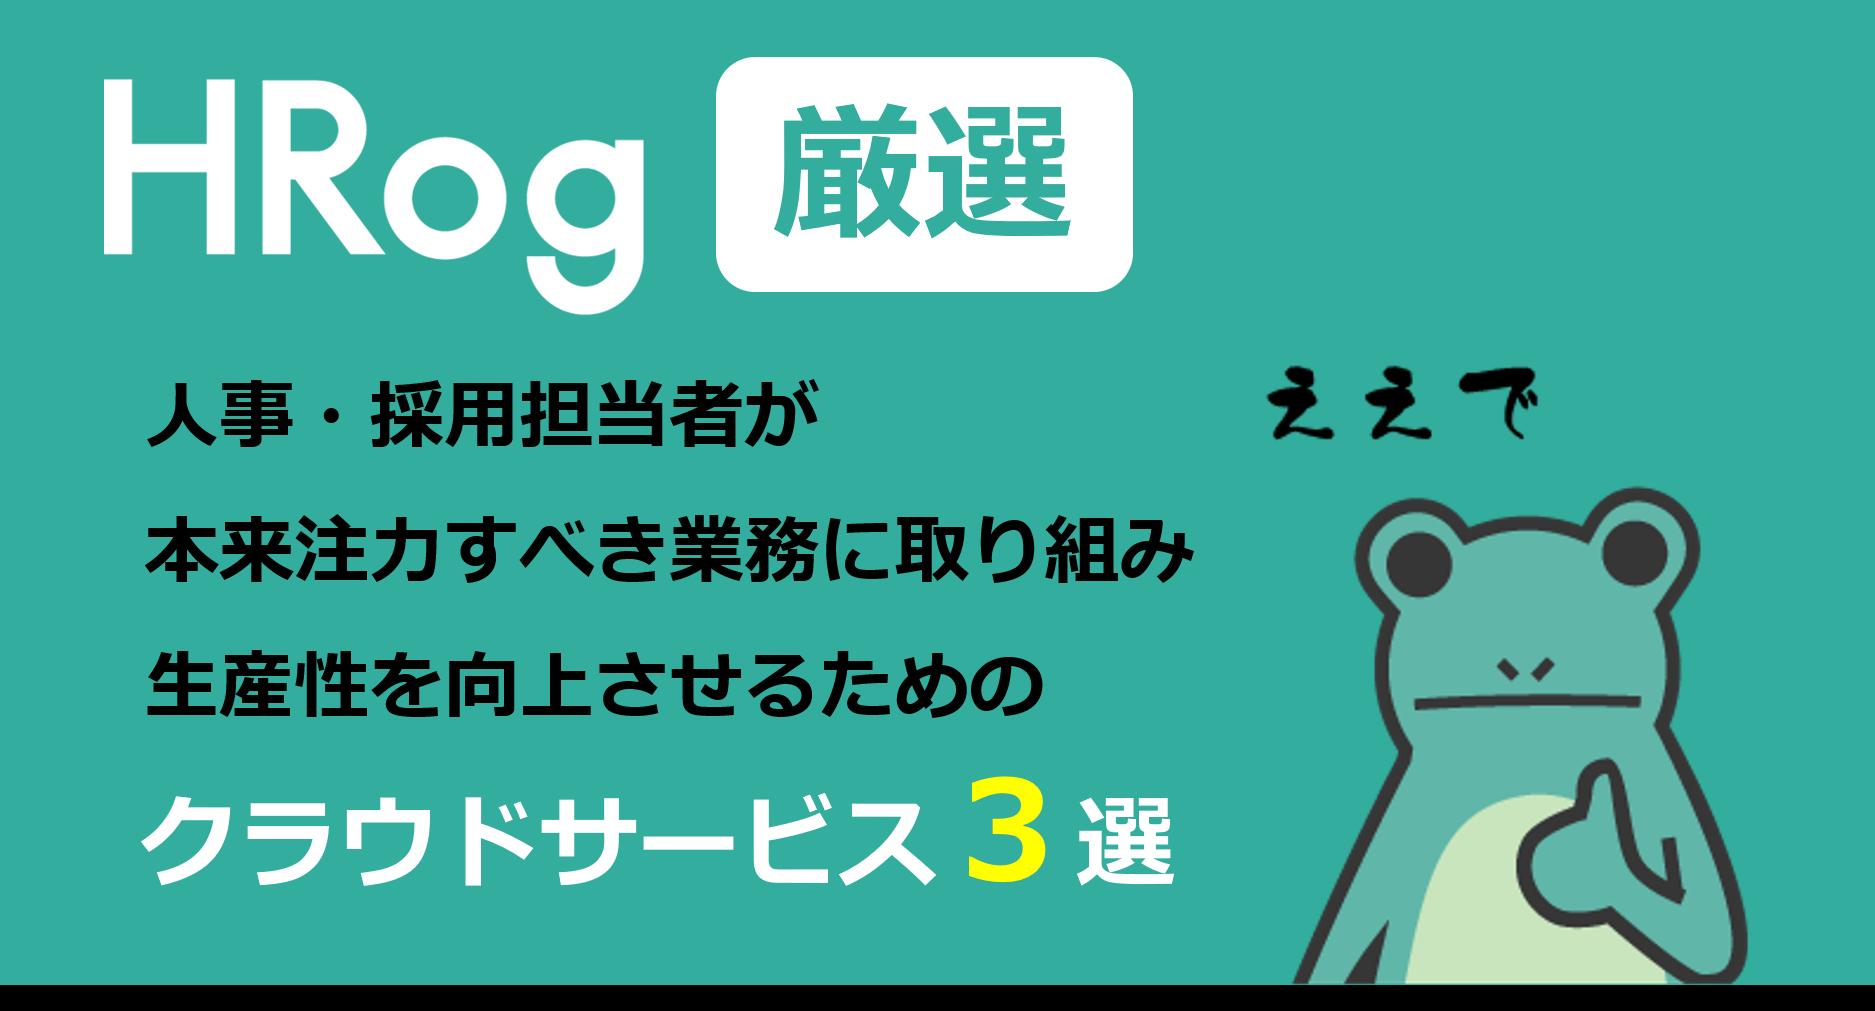 hrog_cloudservices